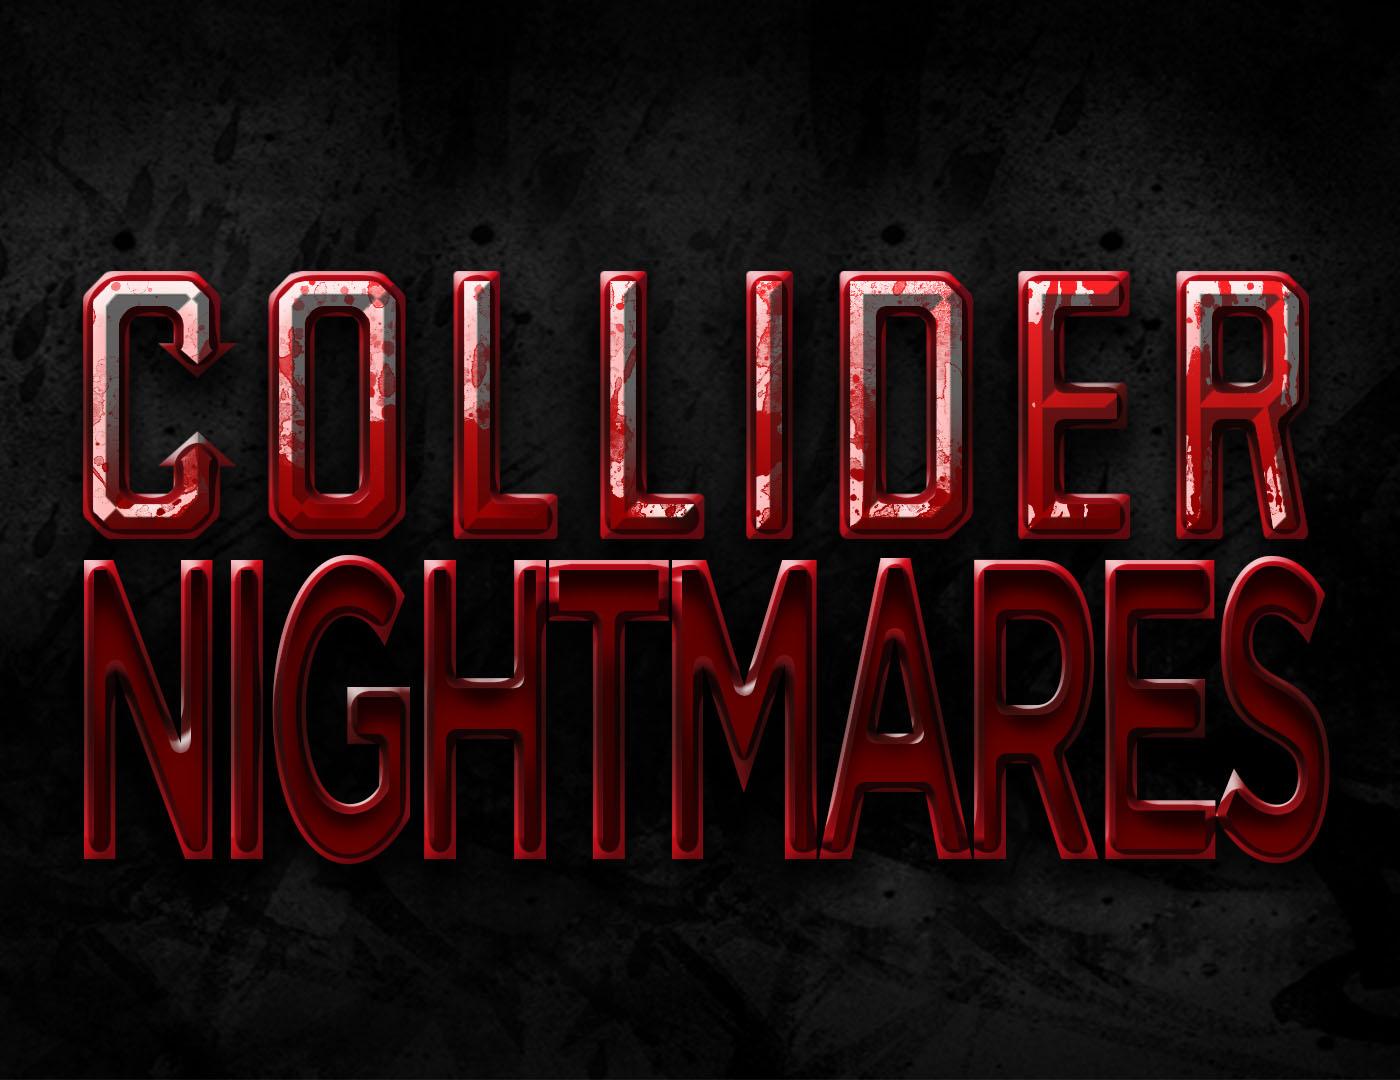 Chris Evans Joins Jekyll - Collider Nightmares